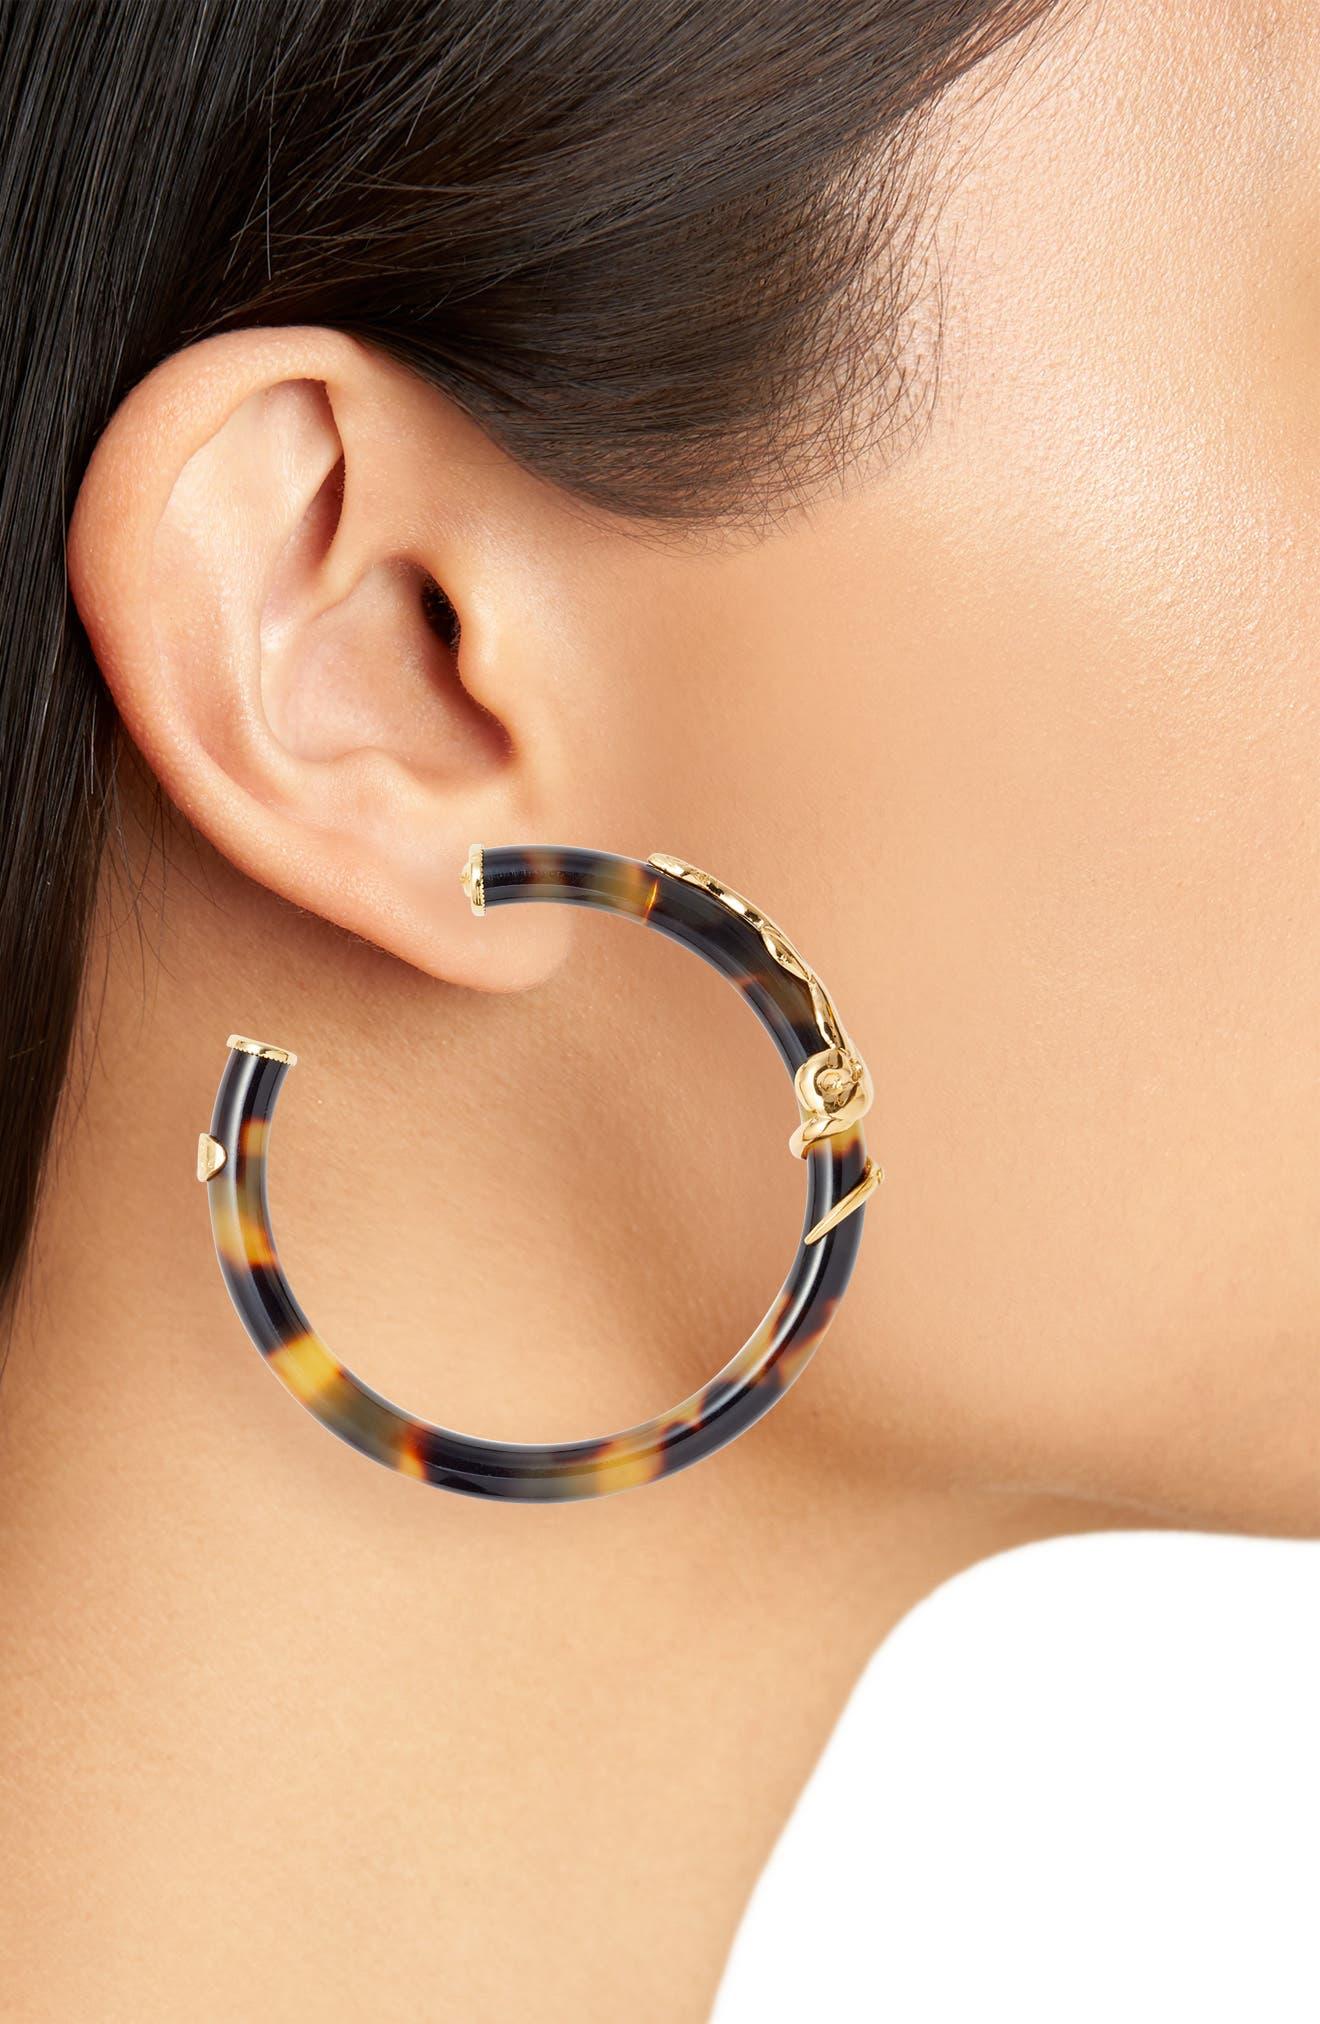 Cobra Hoop Earrings,                             Alternate thumbnail 2, color,                             TORTOISE/ TIGE